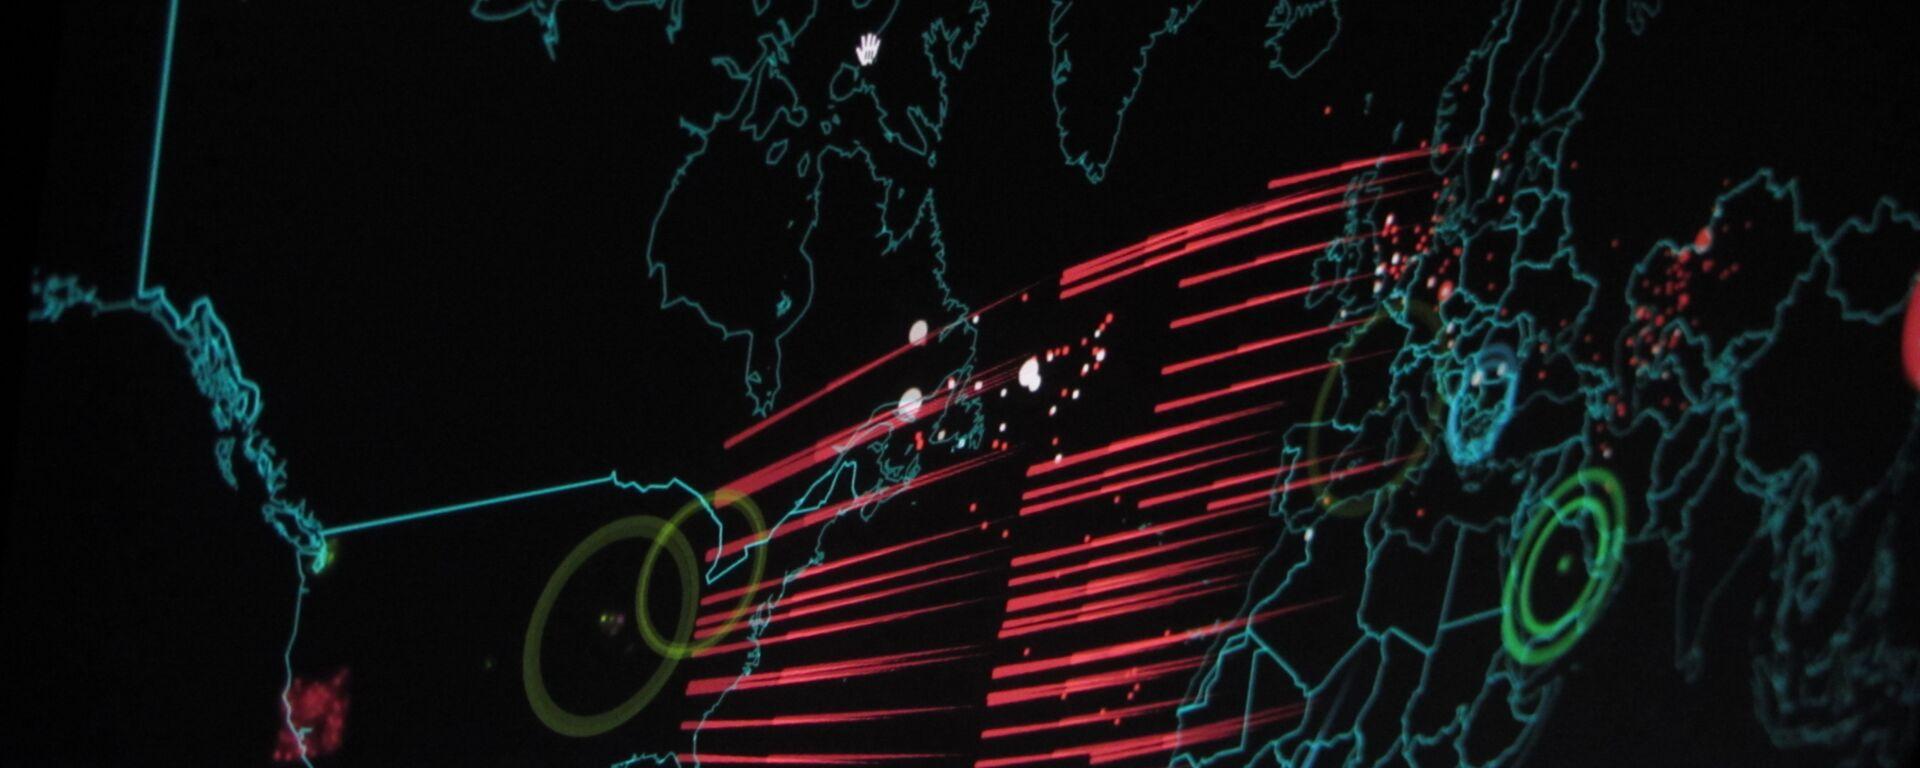 Ciberataques (imagen referencial) - Sputnik Mundo, 1920, 24.06.2021